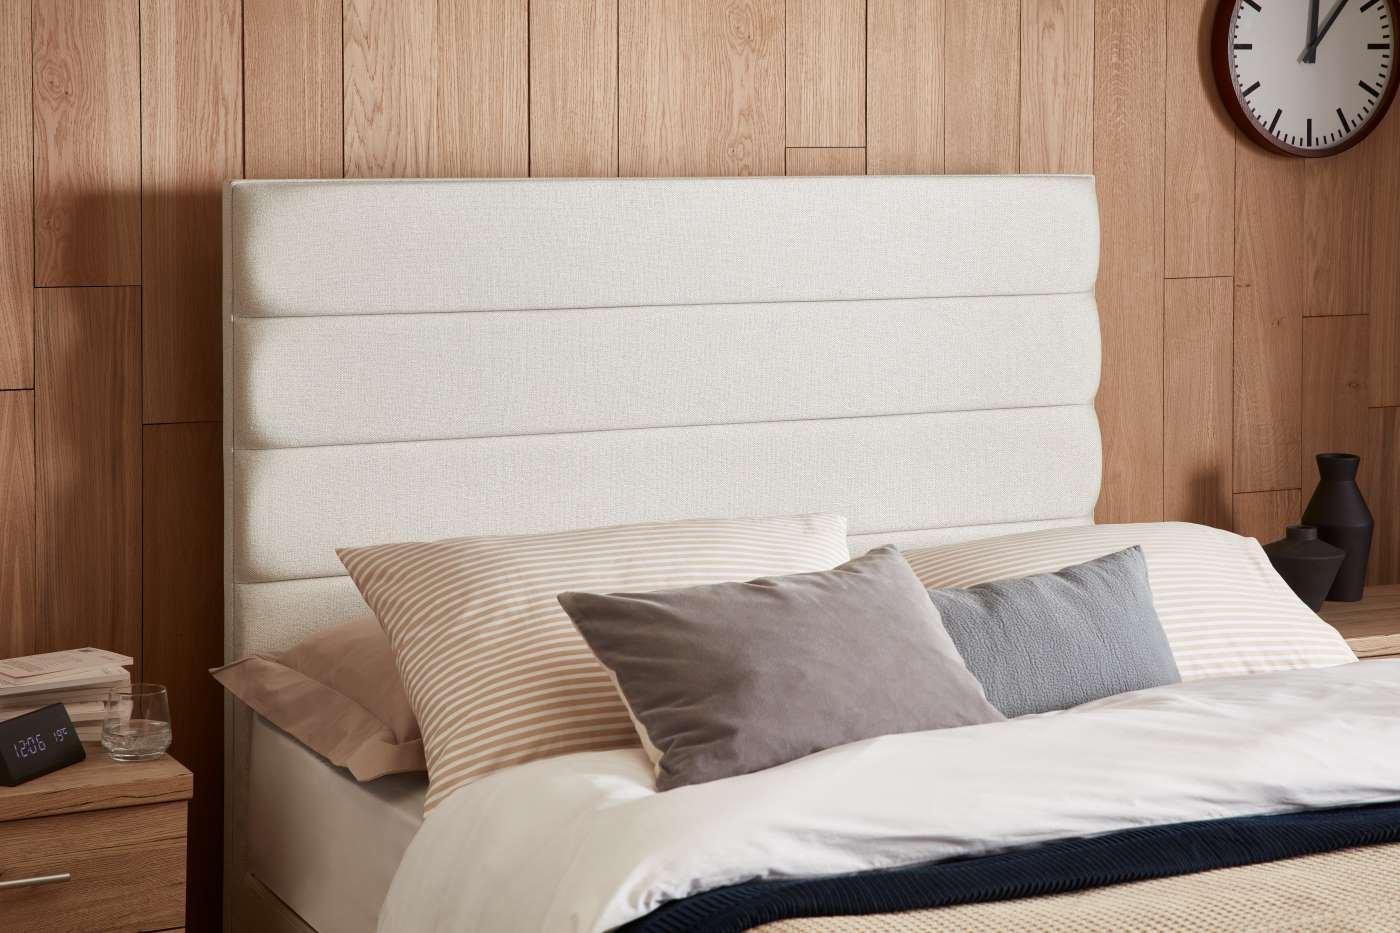 Contract Upholstered Headboard (£129)